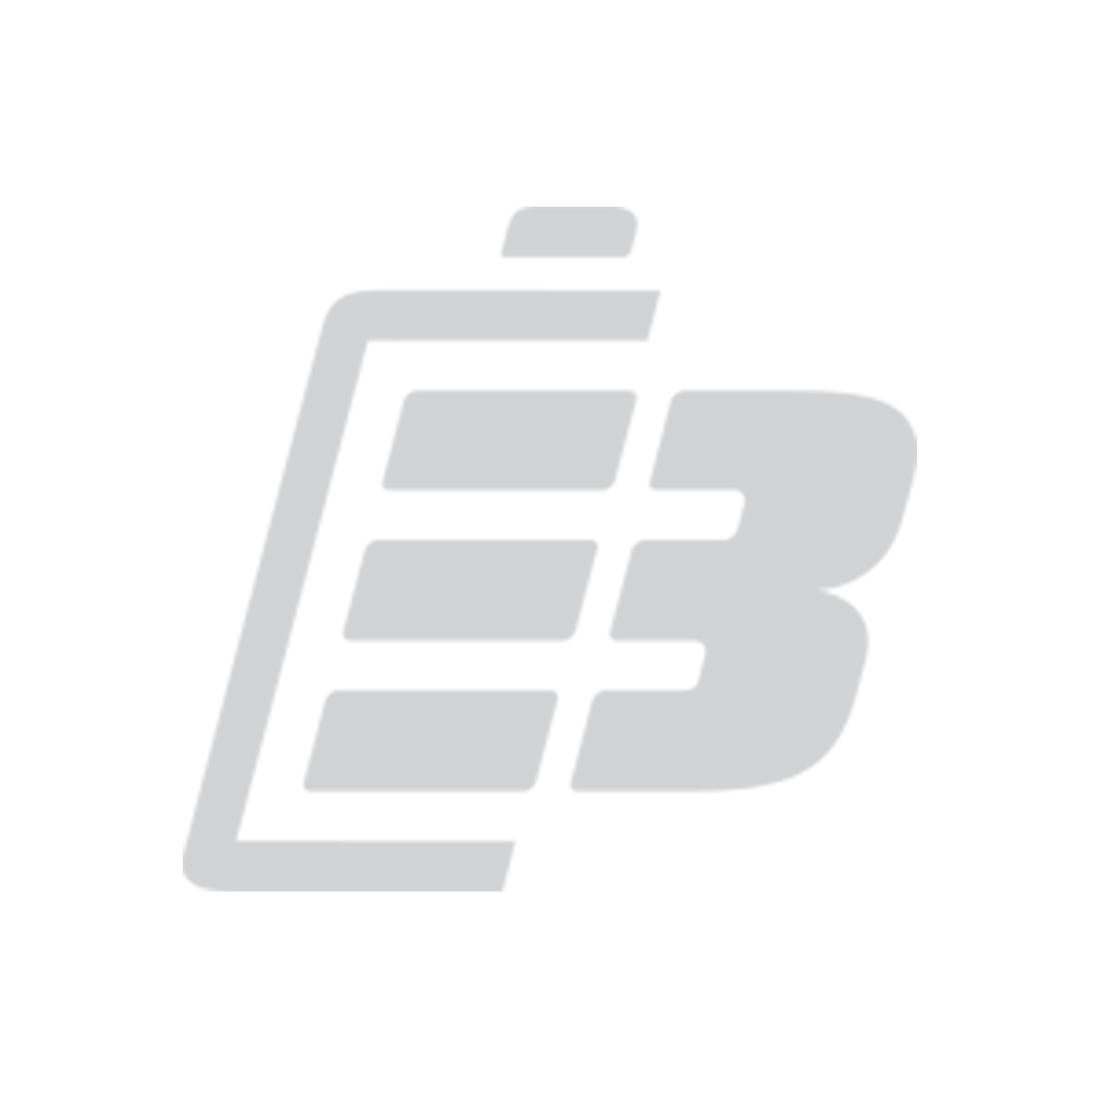 Cordless phone battery Philips Kala 300_1